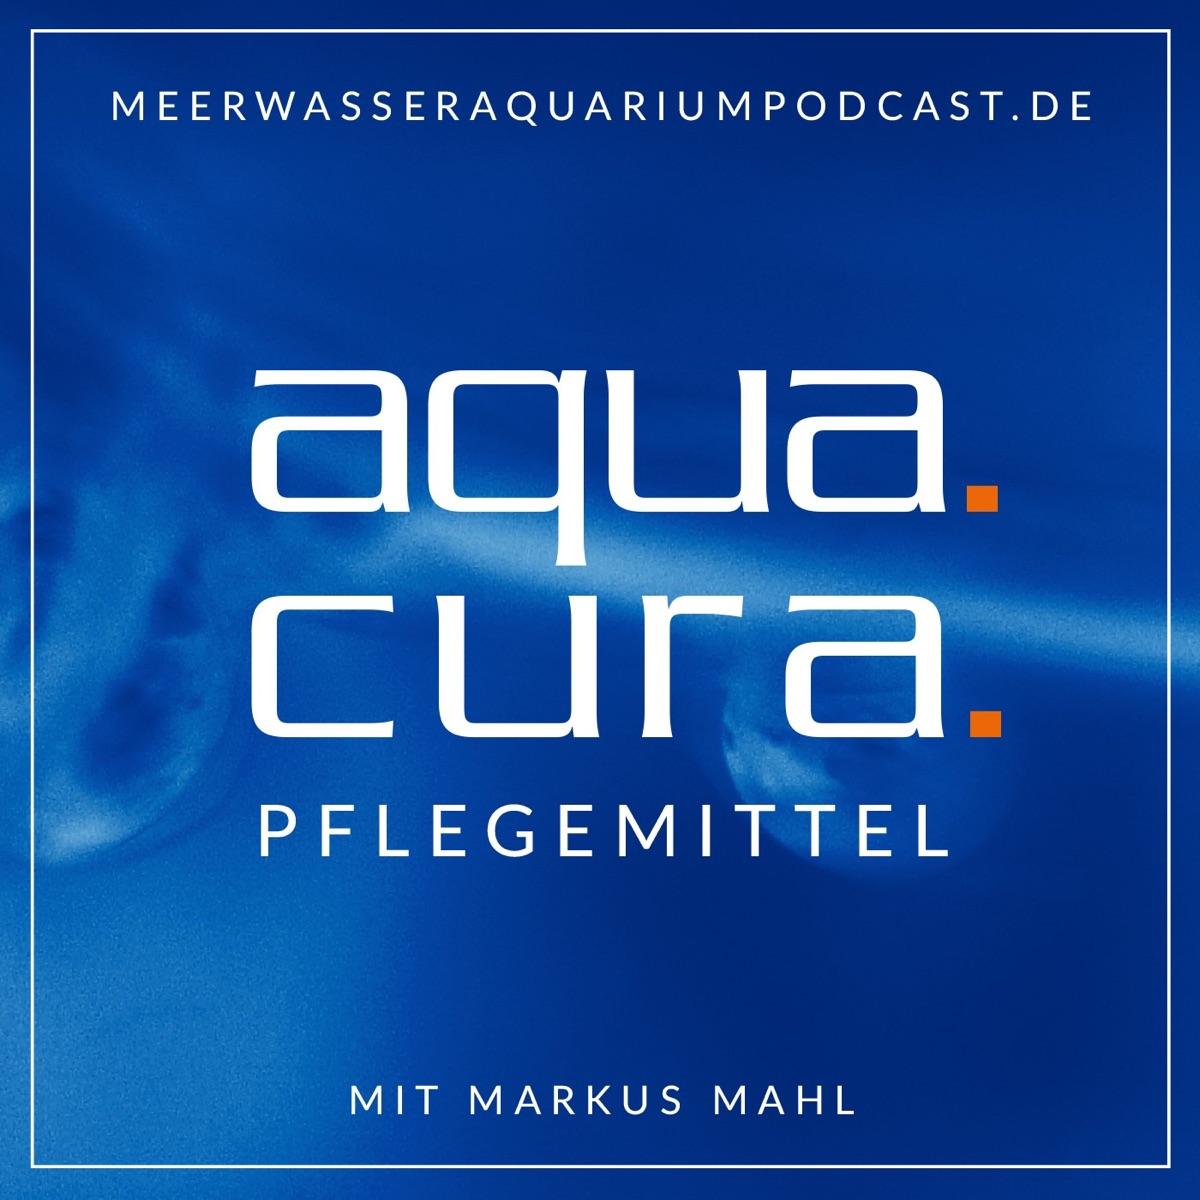 DER Meerwasseraquariumpodcast mit Markus Mahl